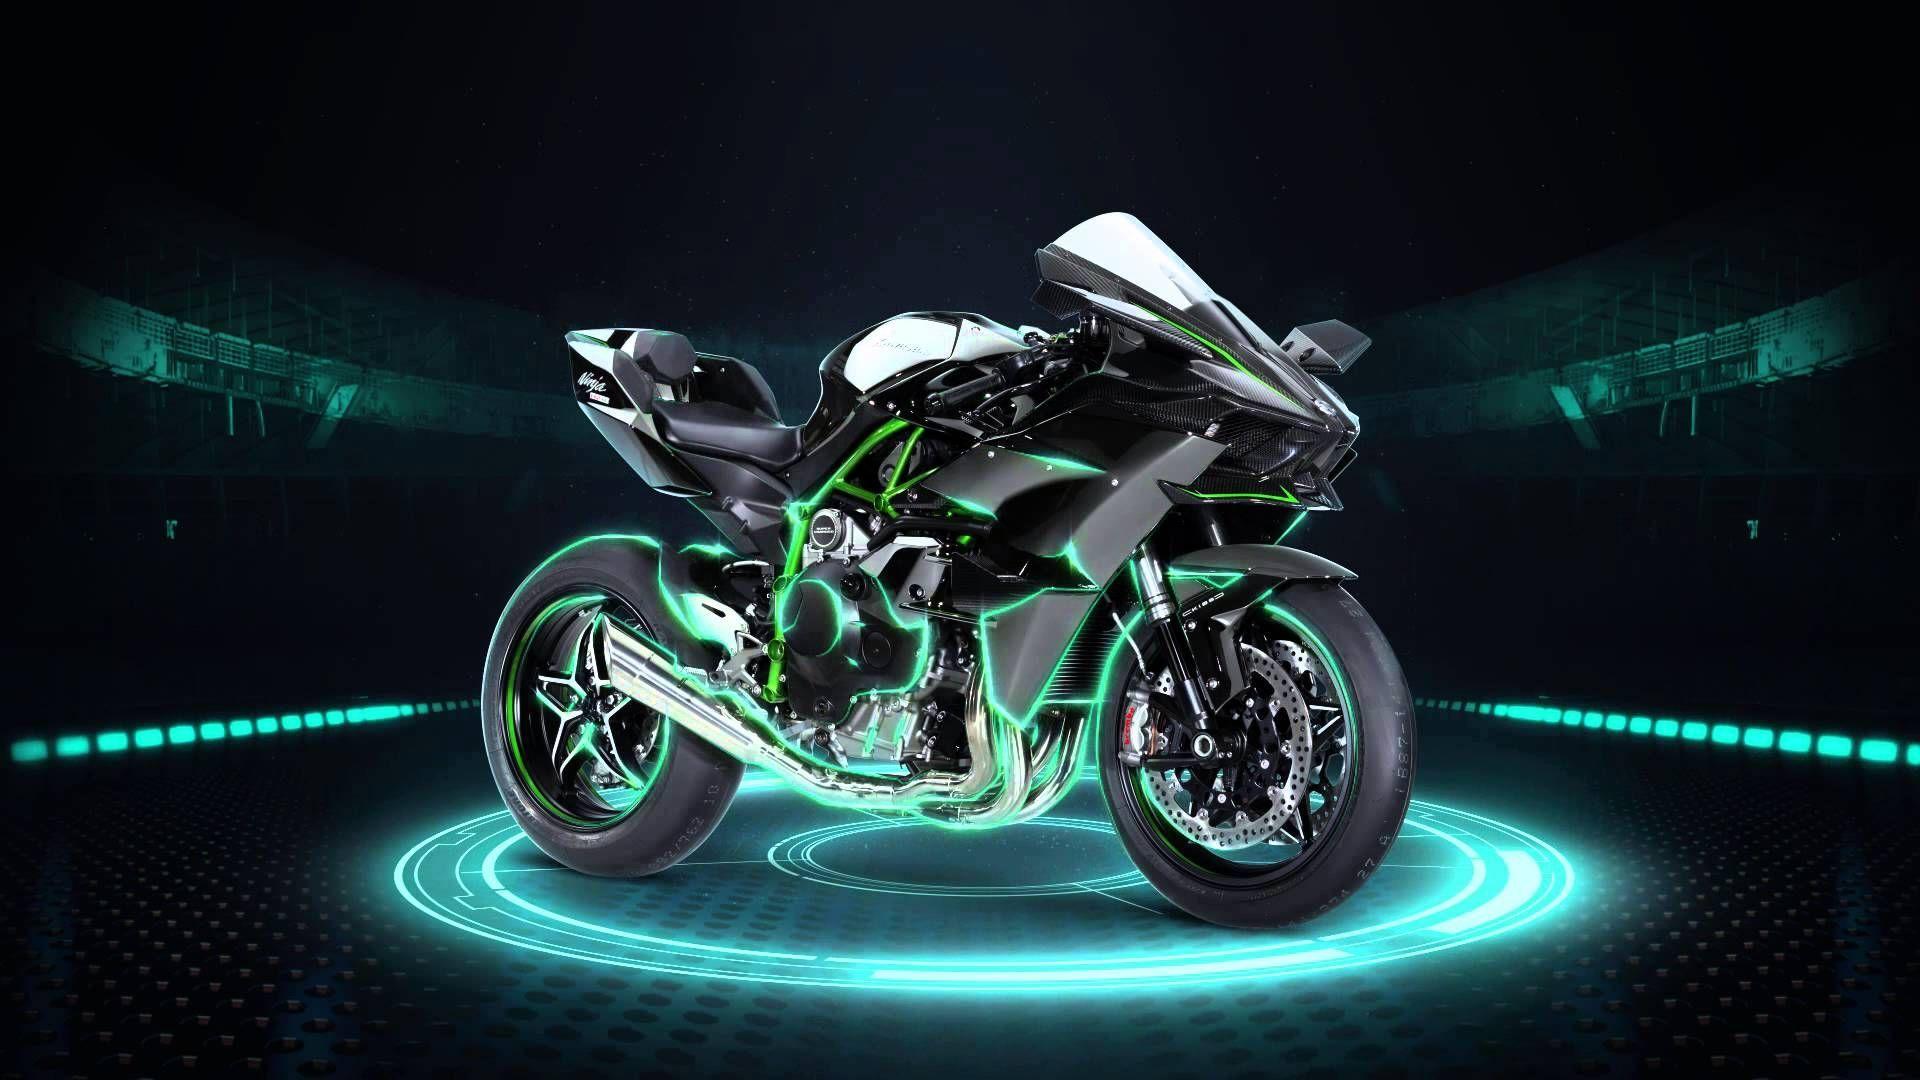 Kawasaki Ninja H2r Fastest Superbike In The Series Z1000 Lighting System Circuit